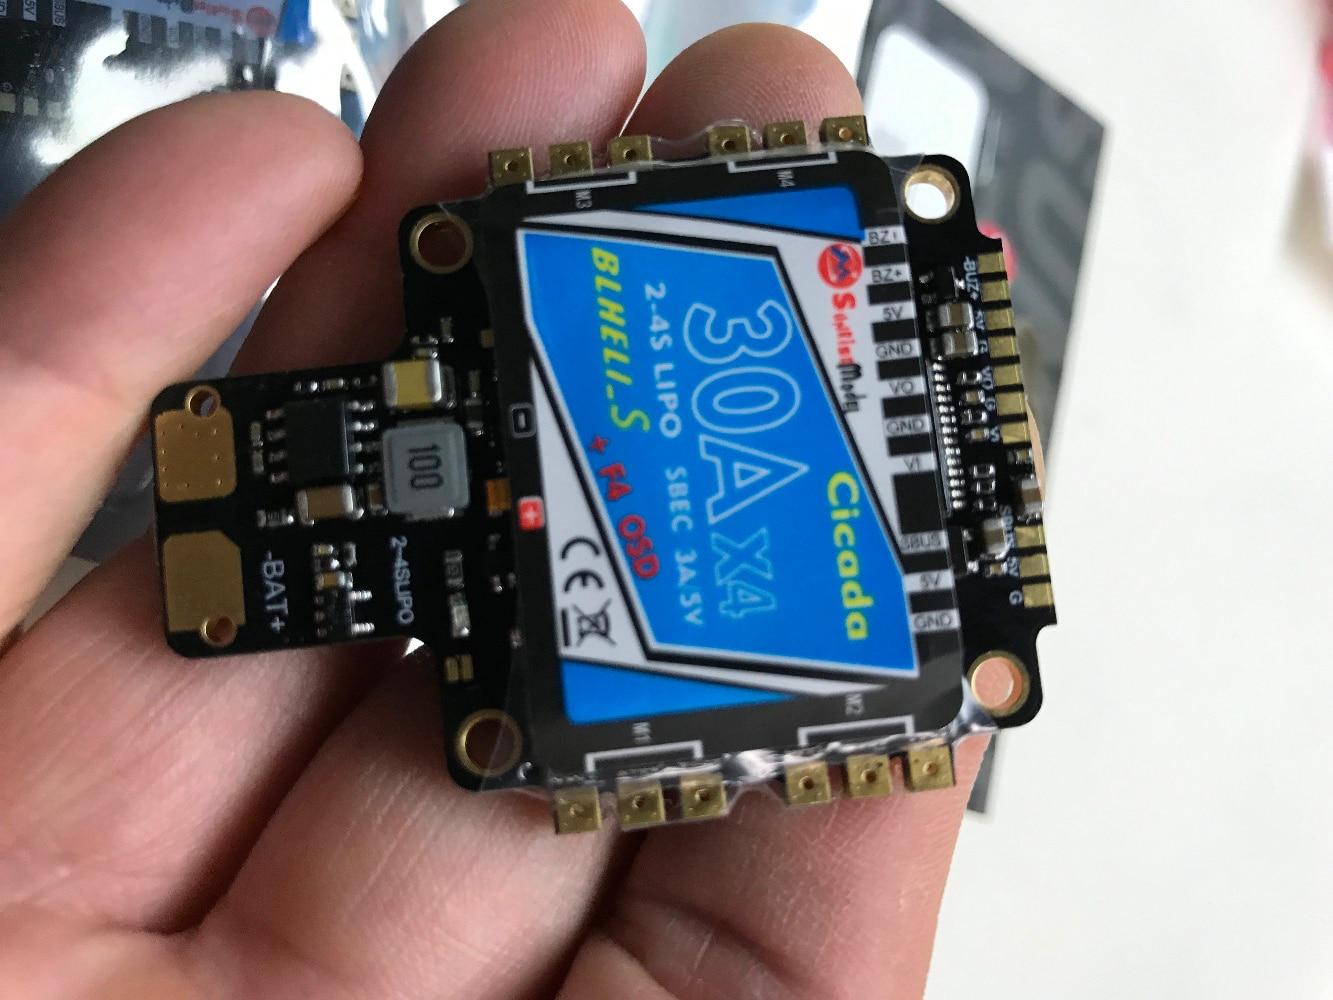 HOBBYMATE Cicada AIO F4 Flight Controller W/30x4 BLHeli_S DSHOT ESC OSD PDB w/BEC Current sensor สำหรับ FPV Racing Drone Quadc-ใน ชิ้นส่วนและอุปกรณ์เสริม จาก ของเล่นและงานอดิเรก บน   3